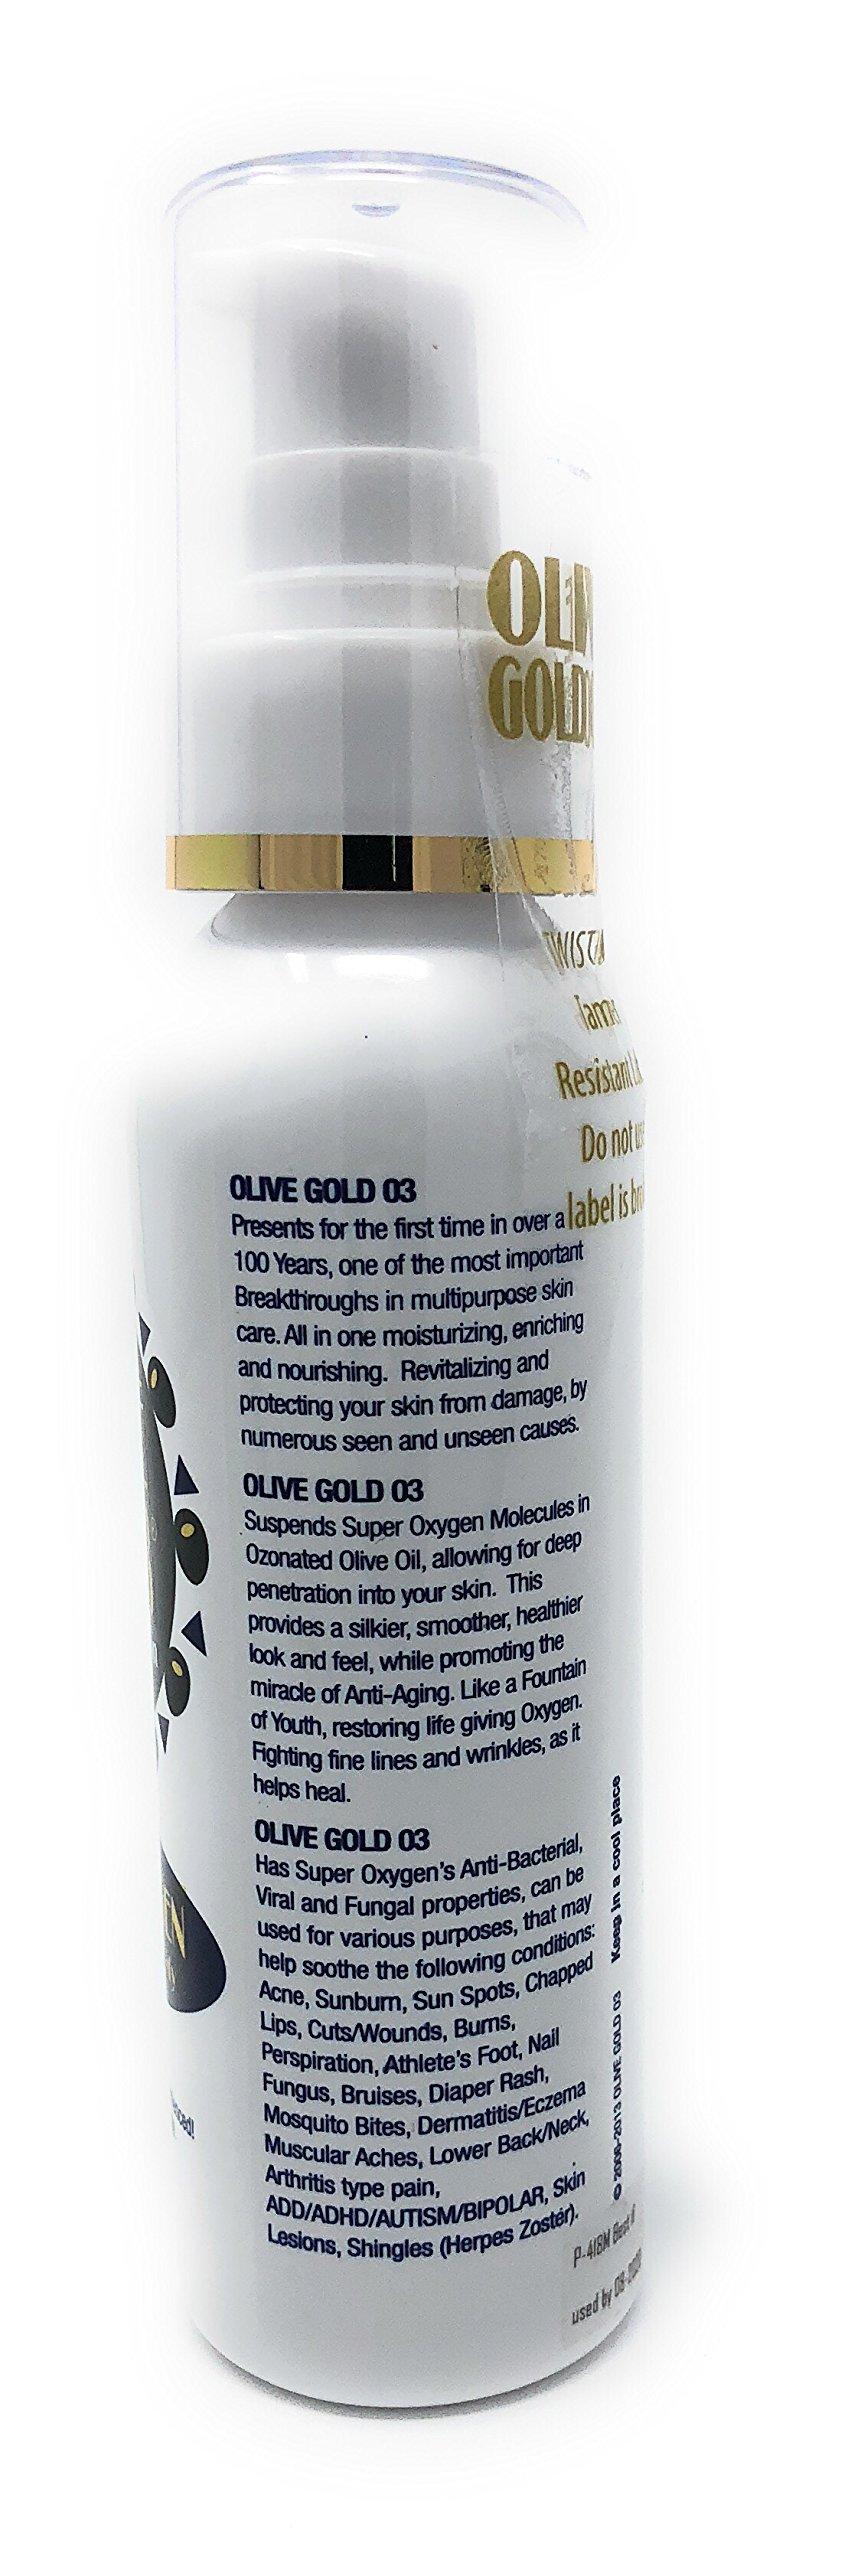 Olive Gold O3 Skin Care Lotion - Ozonated Olive Oil Super Oxygen (4oz) by Olive Gold O3 (Image #3)